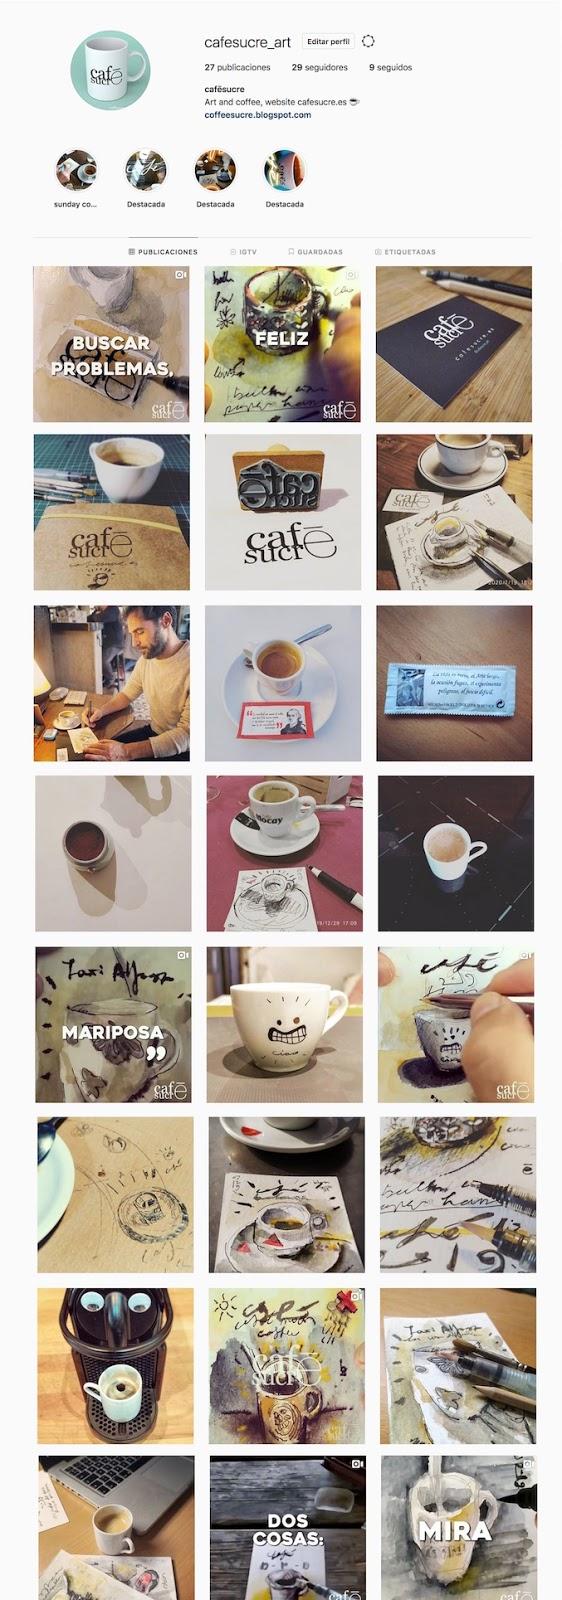 https://www.instagram.com/cafesucre_art/